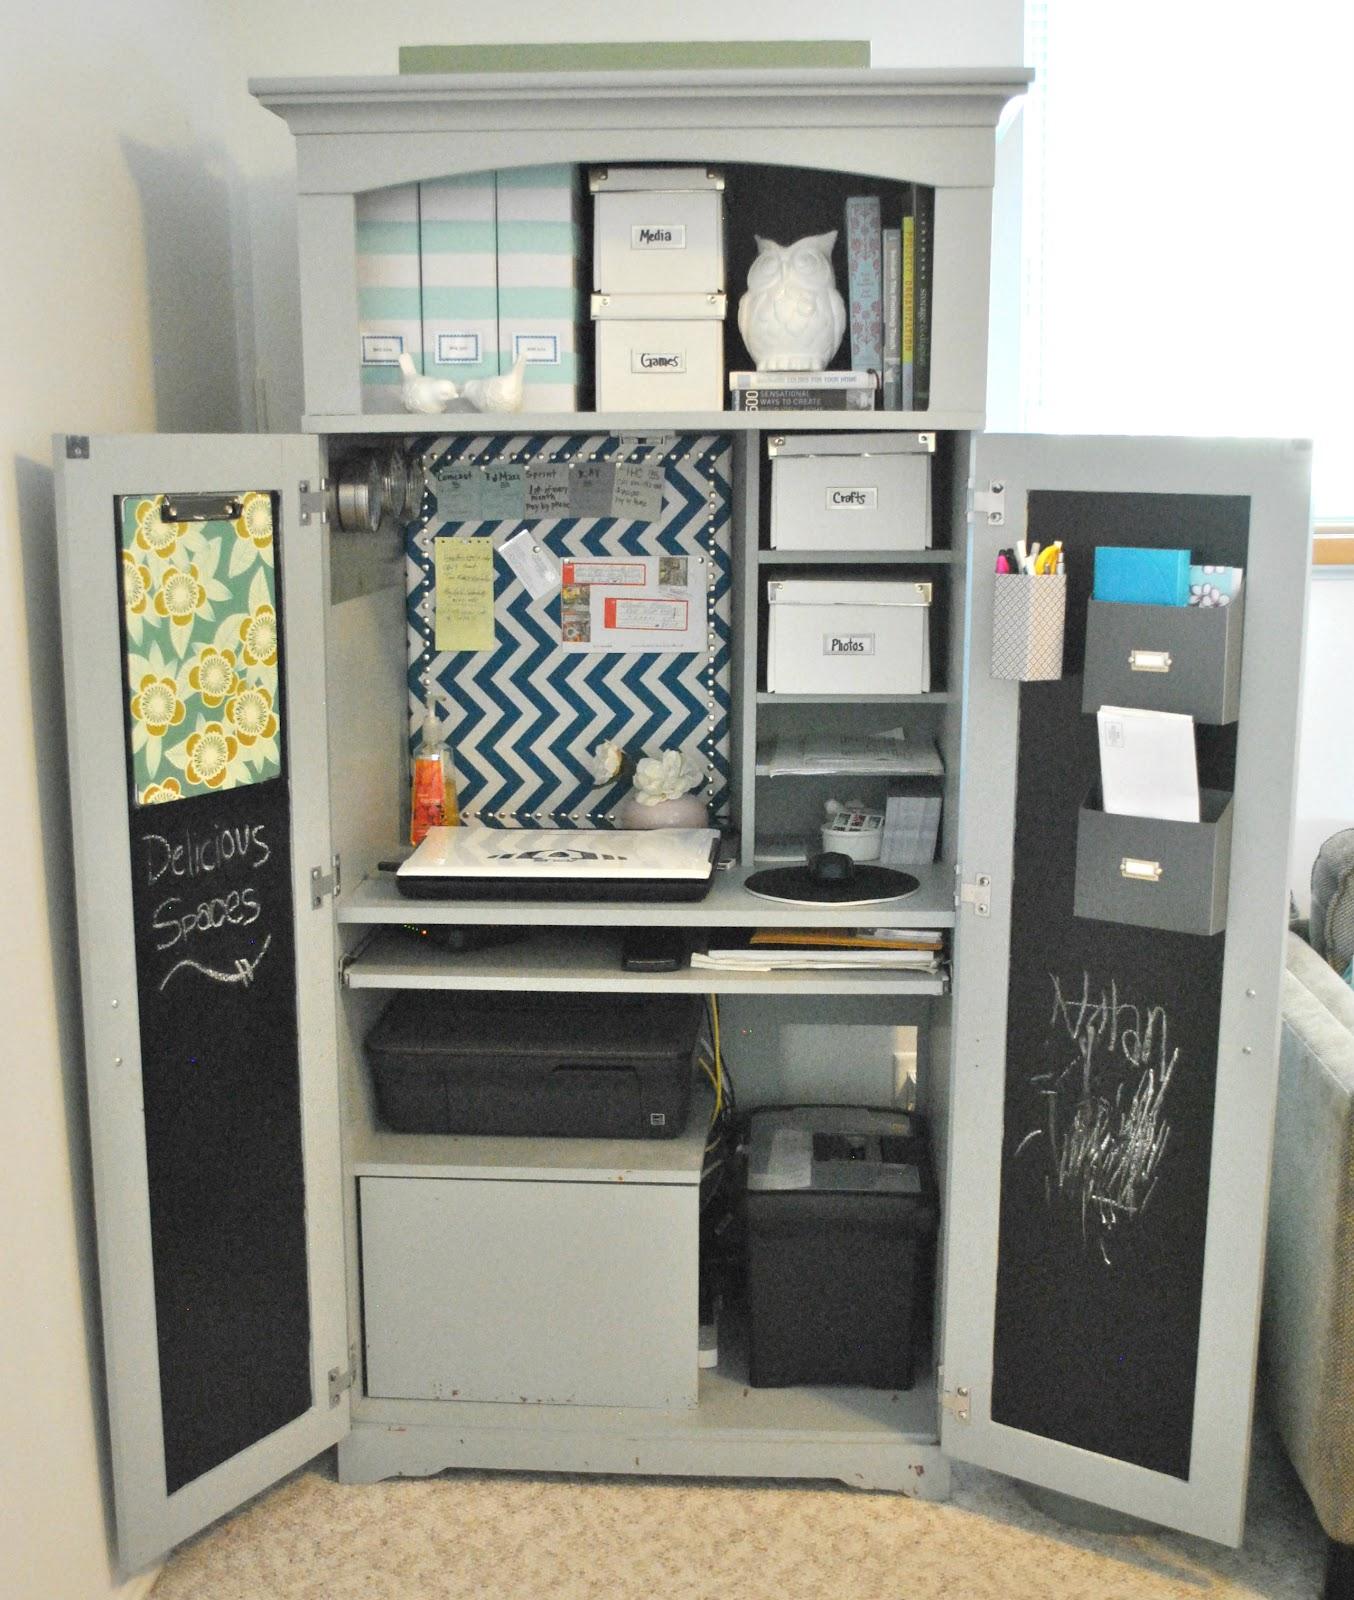 delicious spaces armoire desk reveal